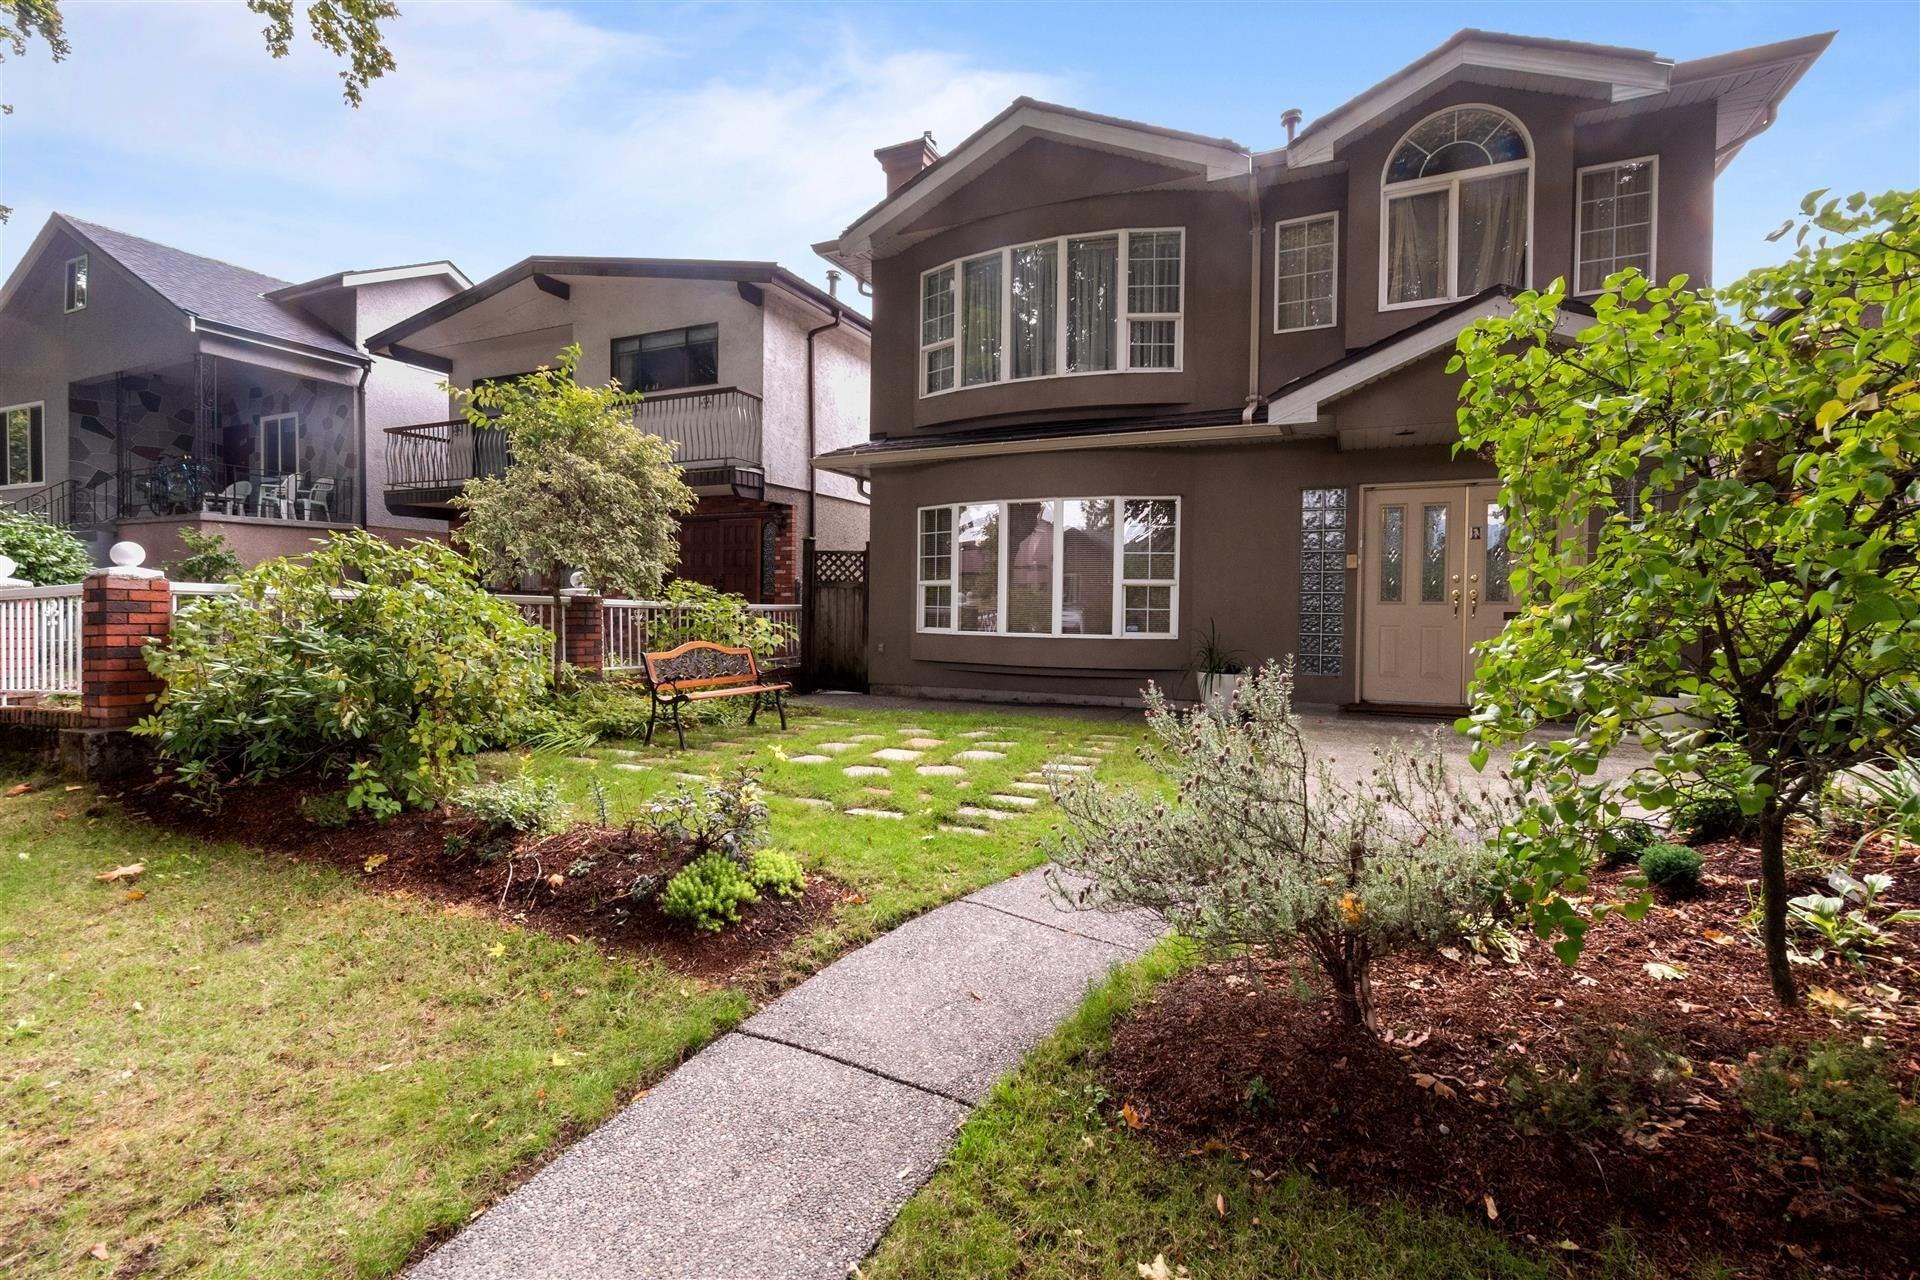 2522 WILLIAM STREET - Renfrew VE House/Single Family for sale, 5 Bedrooms (R2625306) - #1